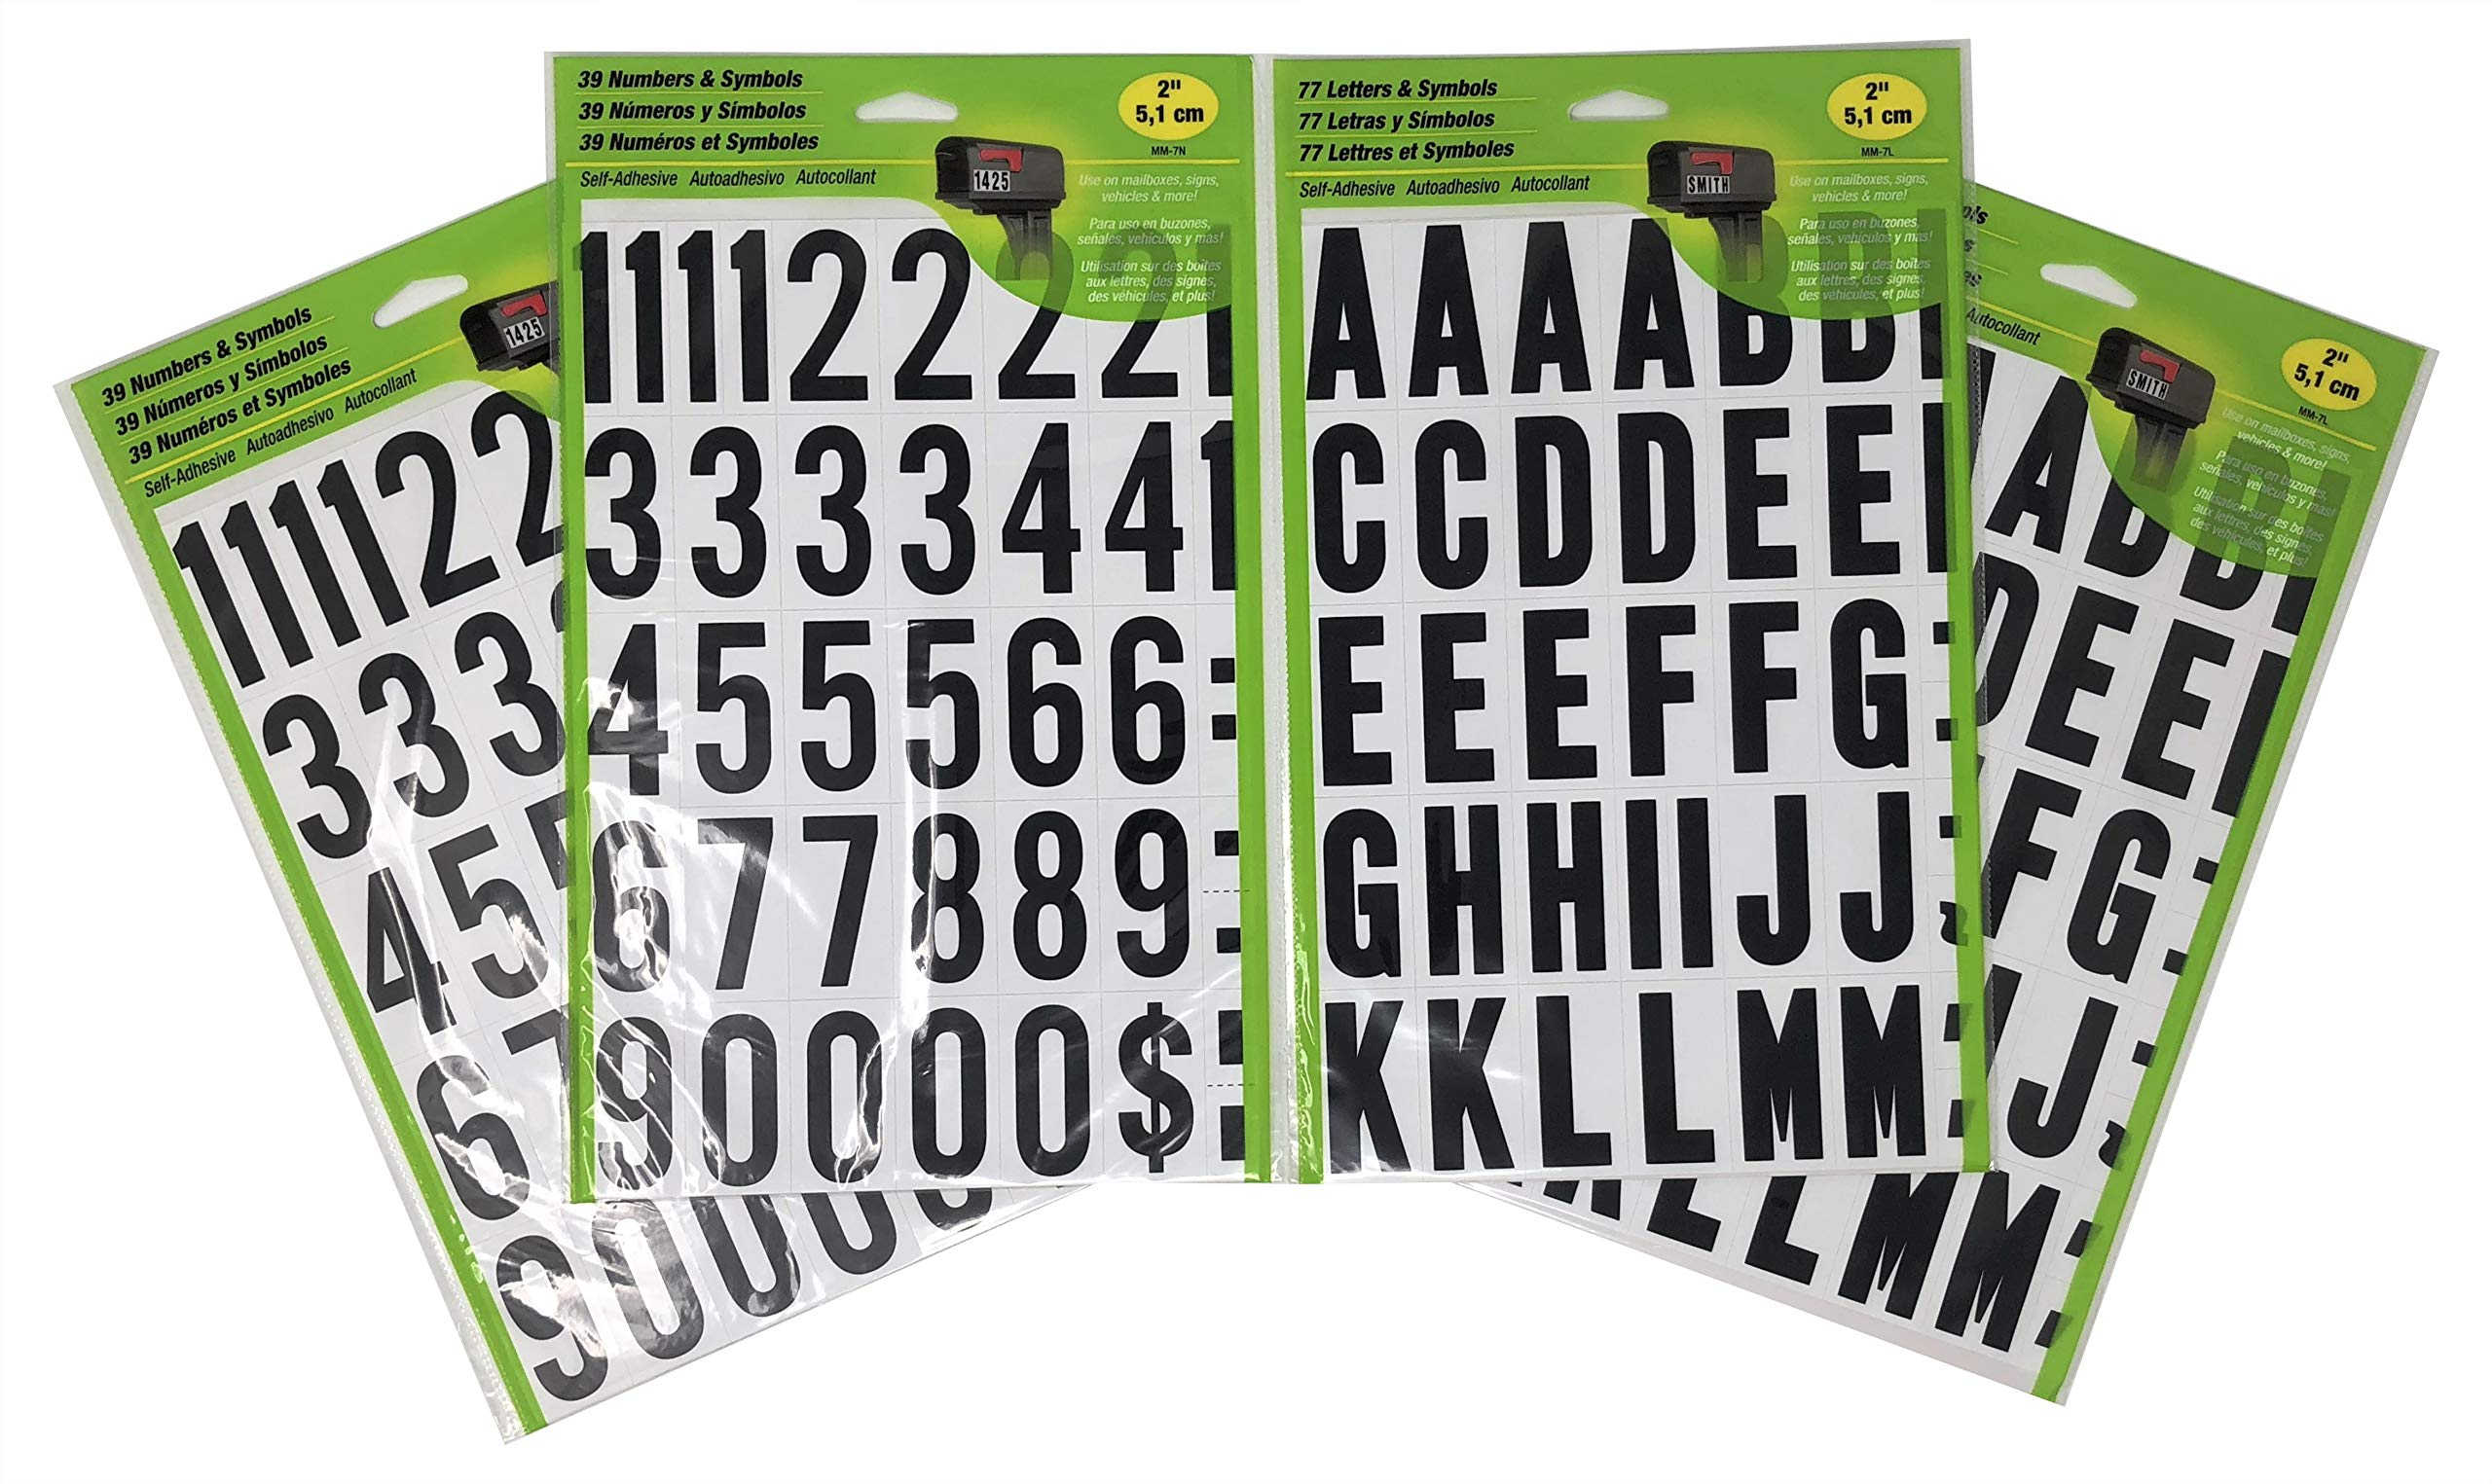 HY-KO Self-Adhesive 2'' Black and White Vinyl Numbers (2-Pack) and Letters (2-Pack) Bundle